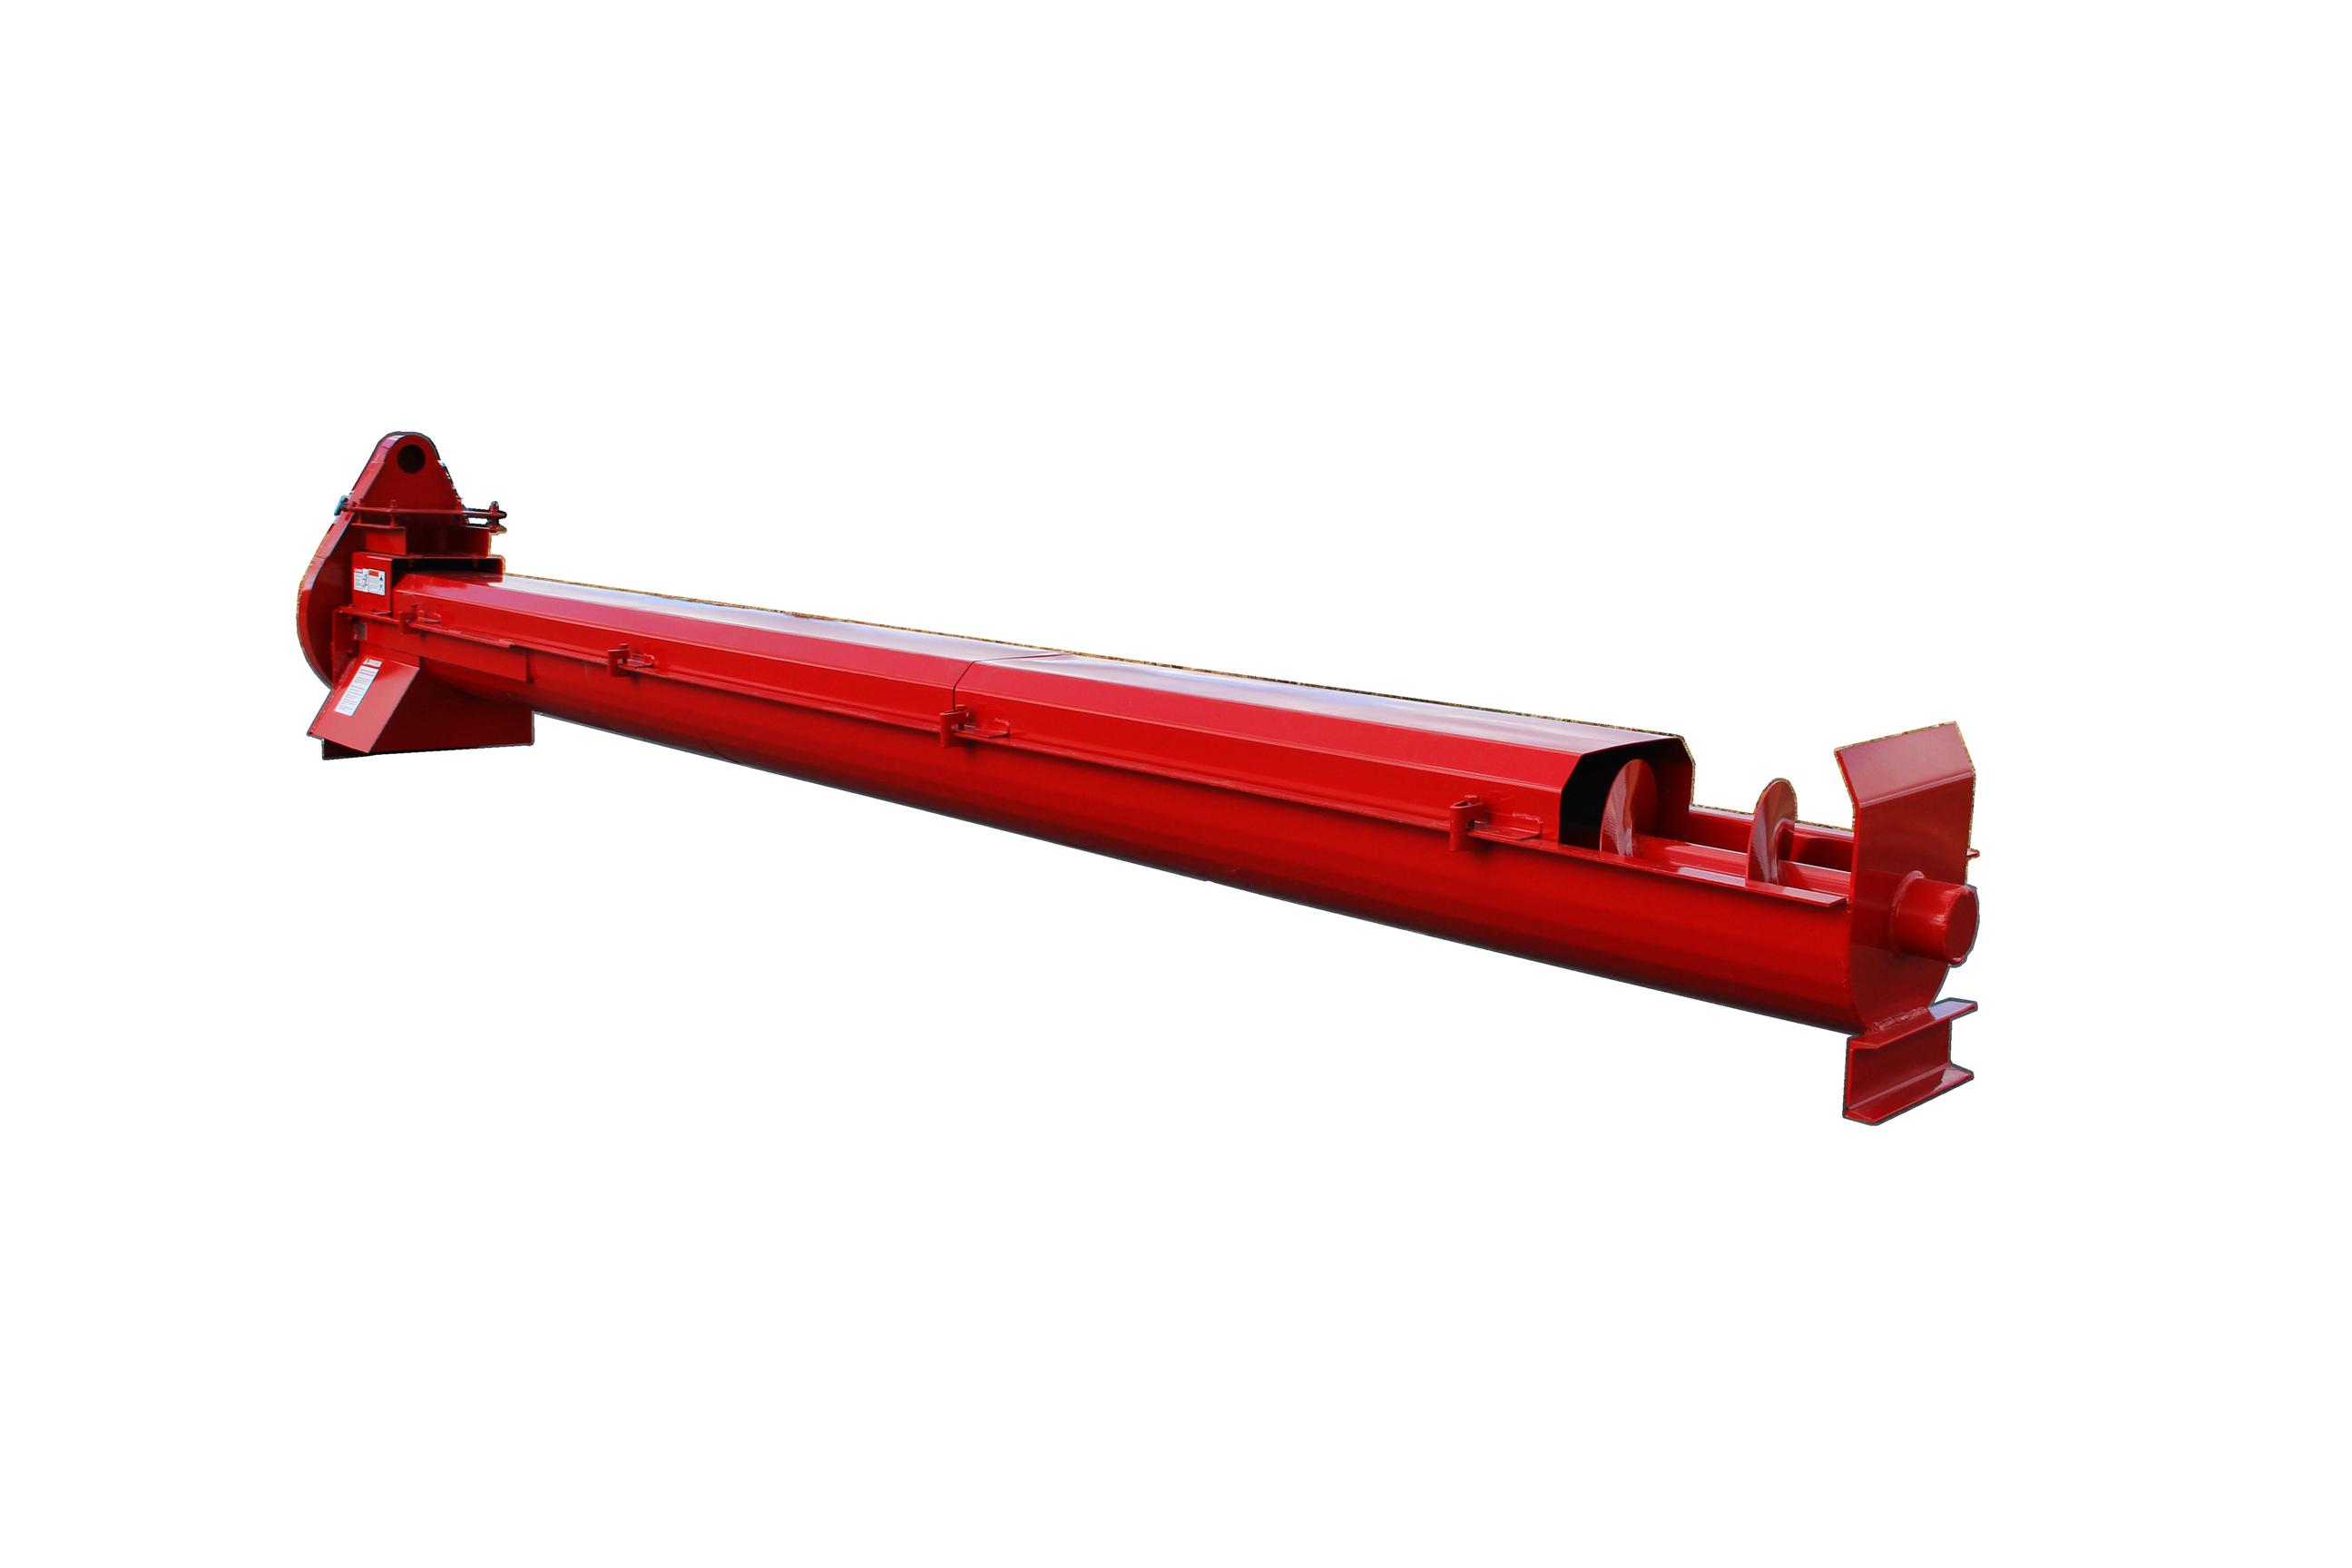 manure-auger-2-emptycompressed.png